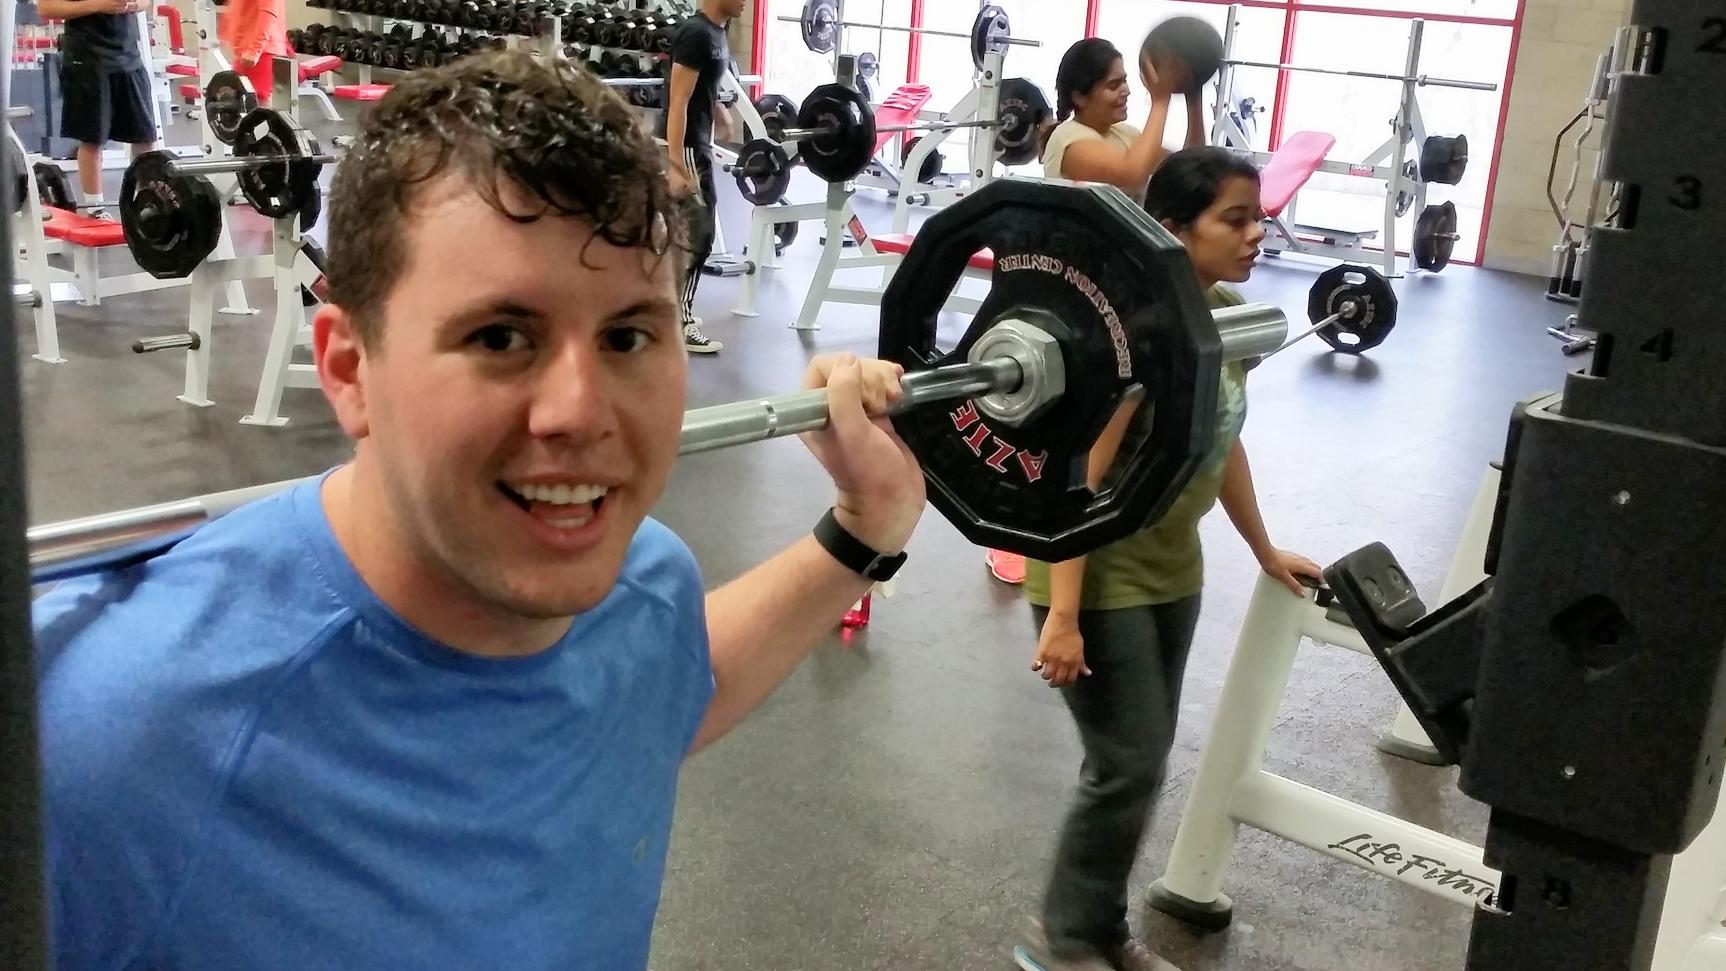 Patrick squatting at the Aztec Recreation center.